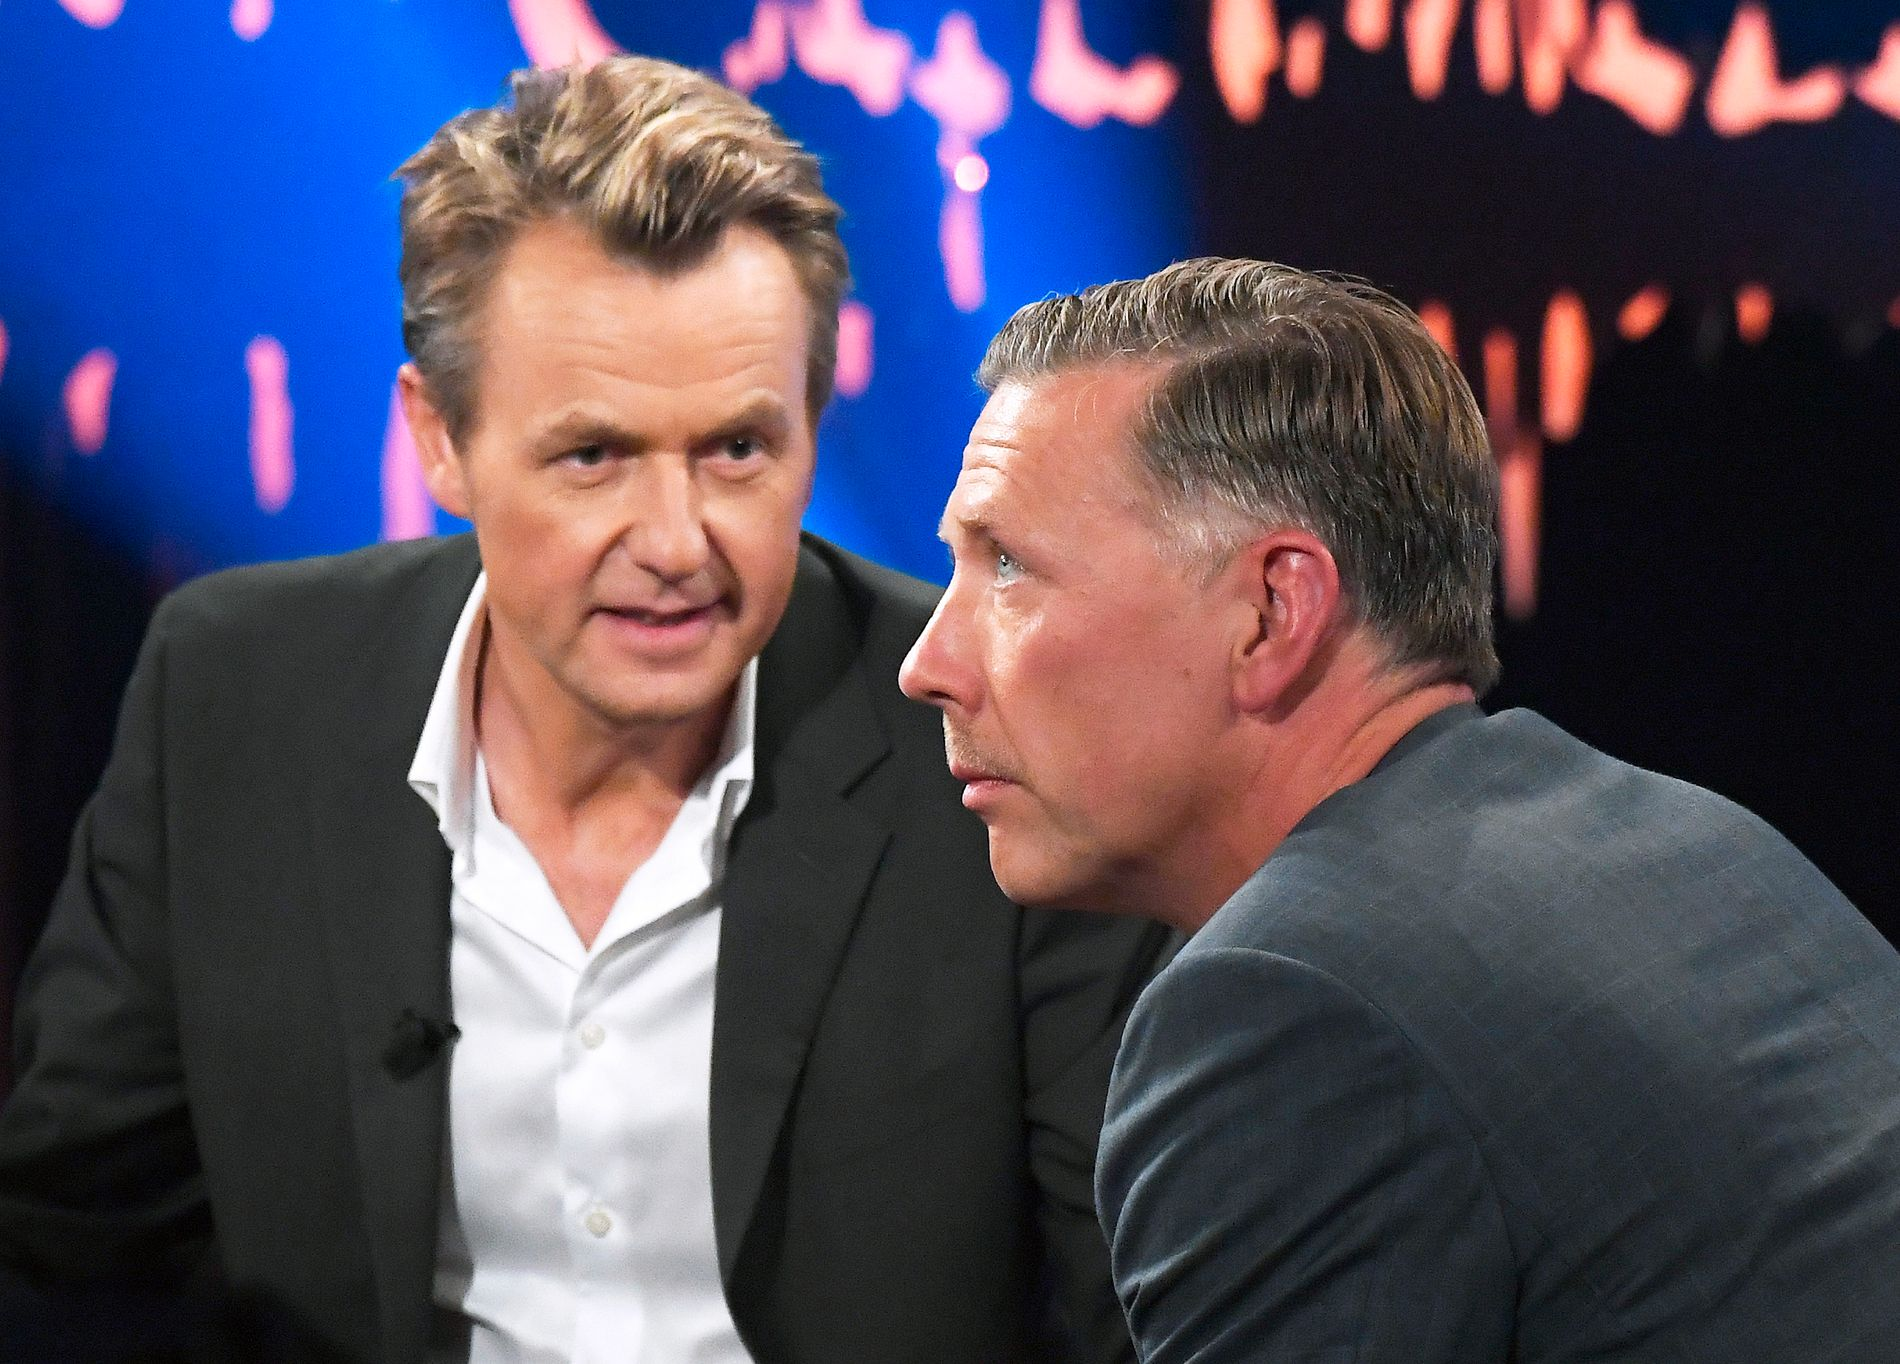 TALKSHOW-GJEST: Mikael Persbrandt besøkte Fredrik Skavlan i talkshowet i fjor. Det gamle sjalusidramaet var ikke tema.